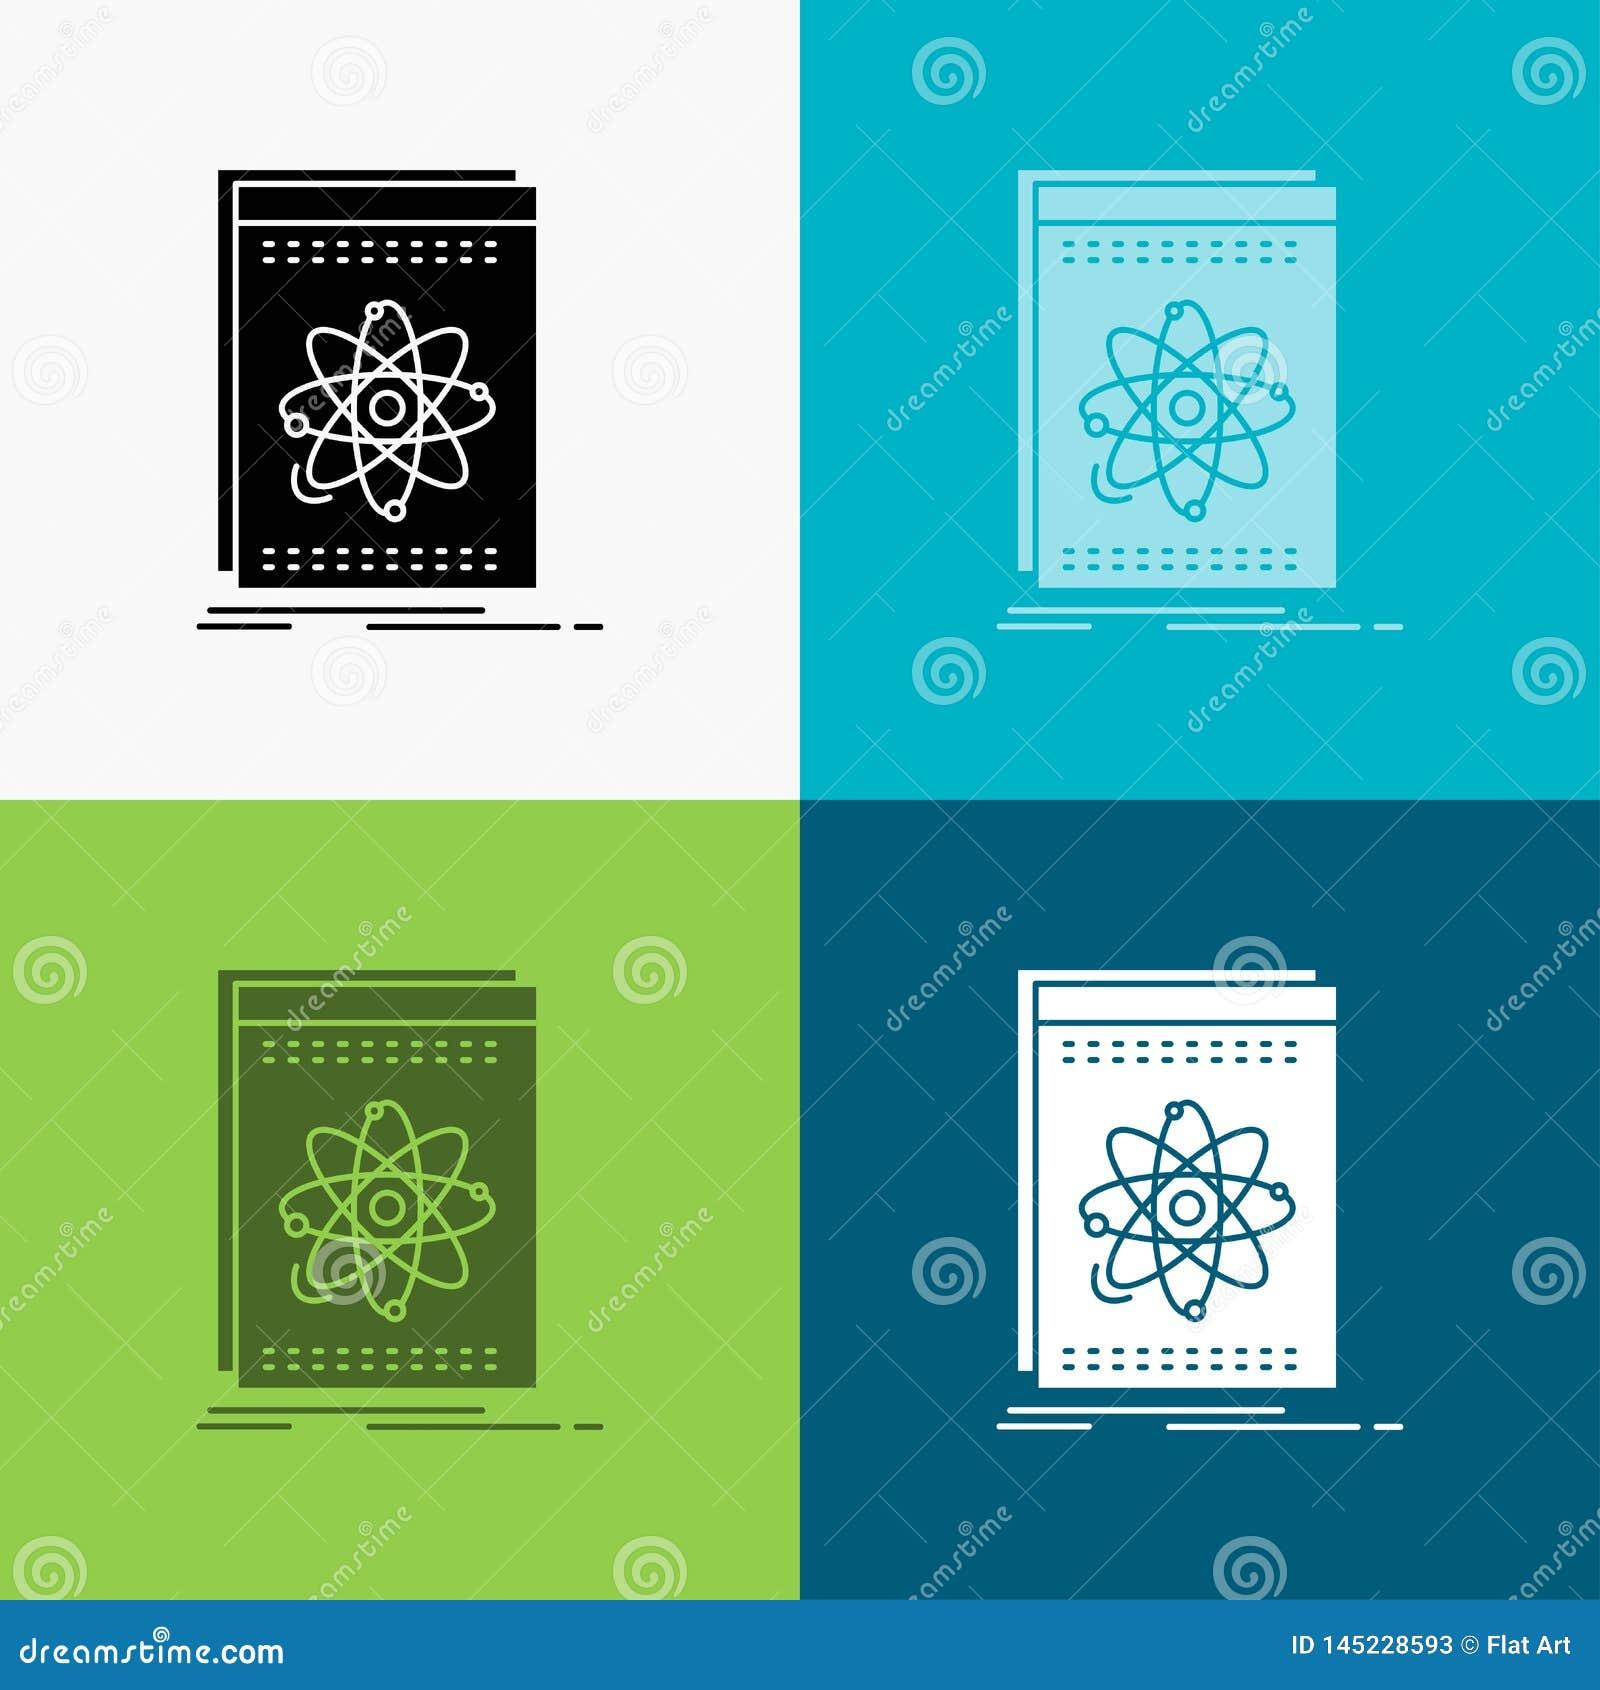 Api, Application, Developer, Platform, Science Icon Over Various